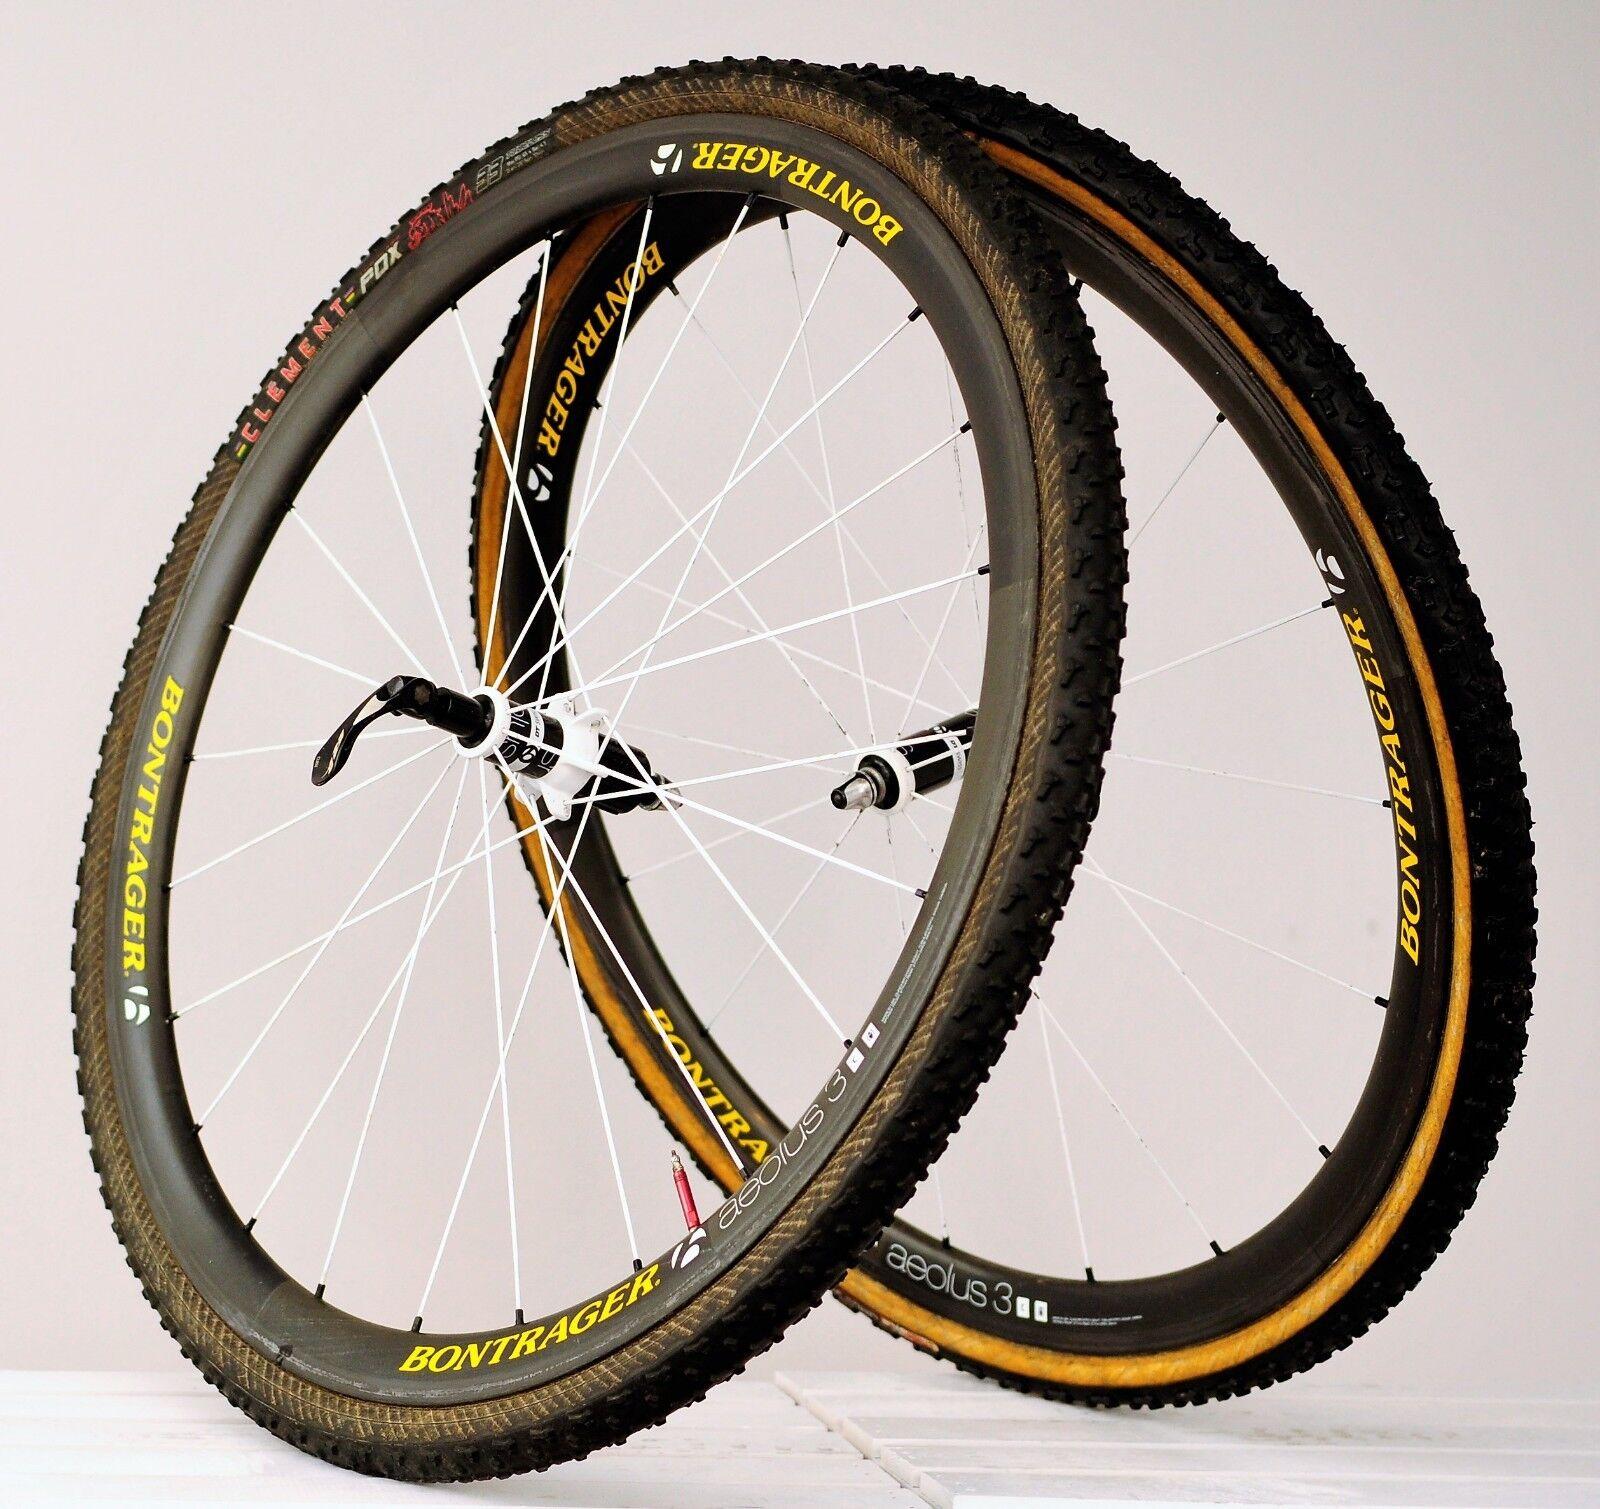 Bontrager Aeolus 3 Tubular Carbon Wheelset - 11-Speed, DT Swiss Cyclocross cross